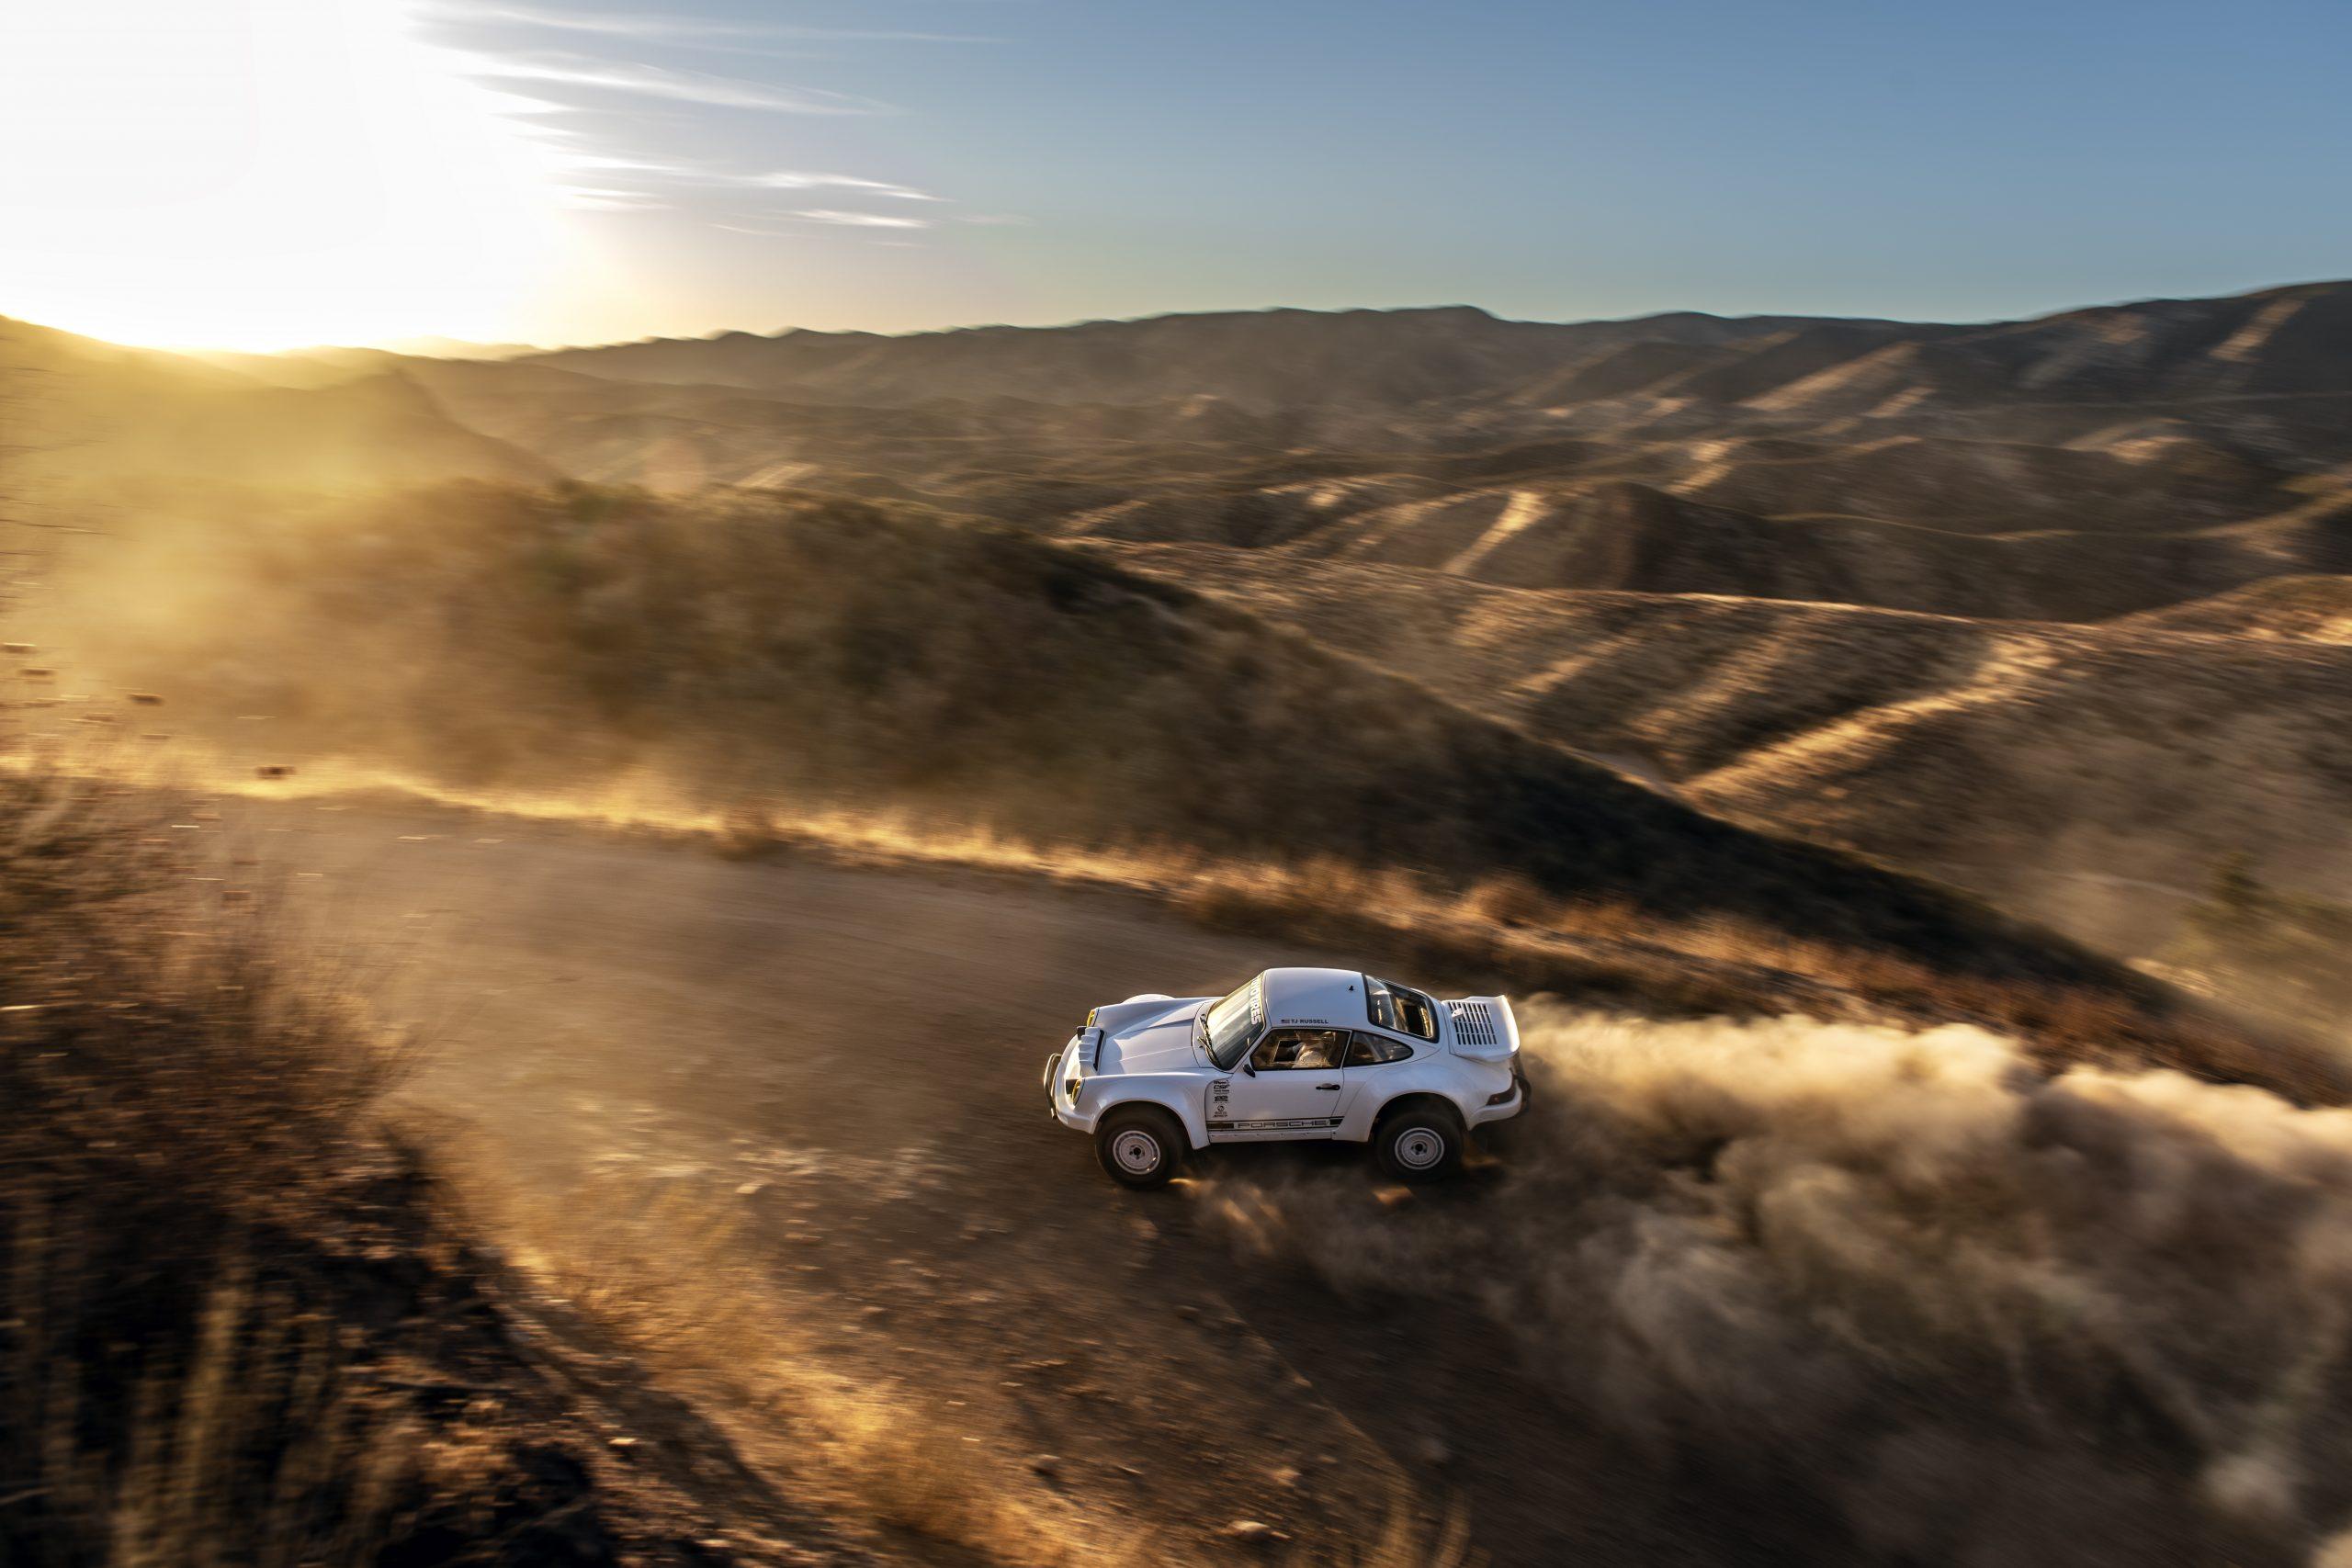 911 Safari story TJ Russell 911 Baja overhead dynamic dirt road action